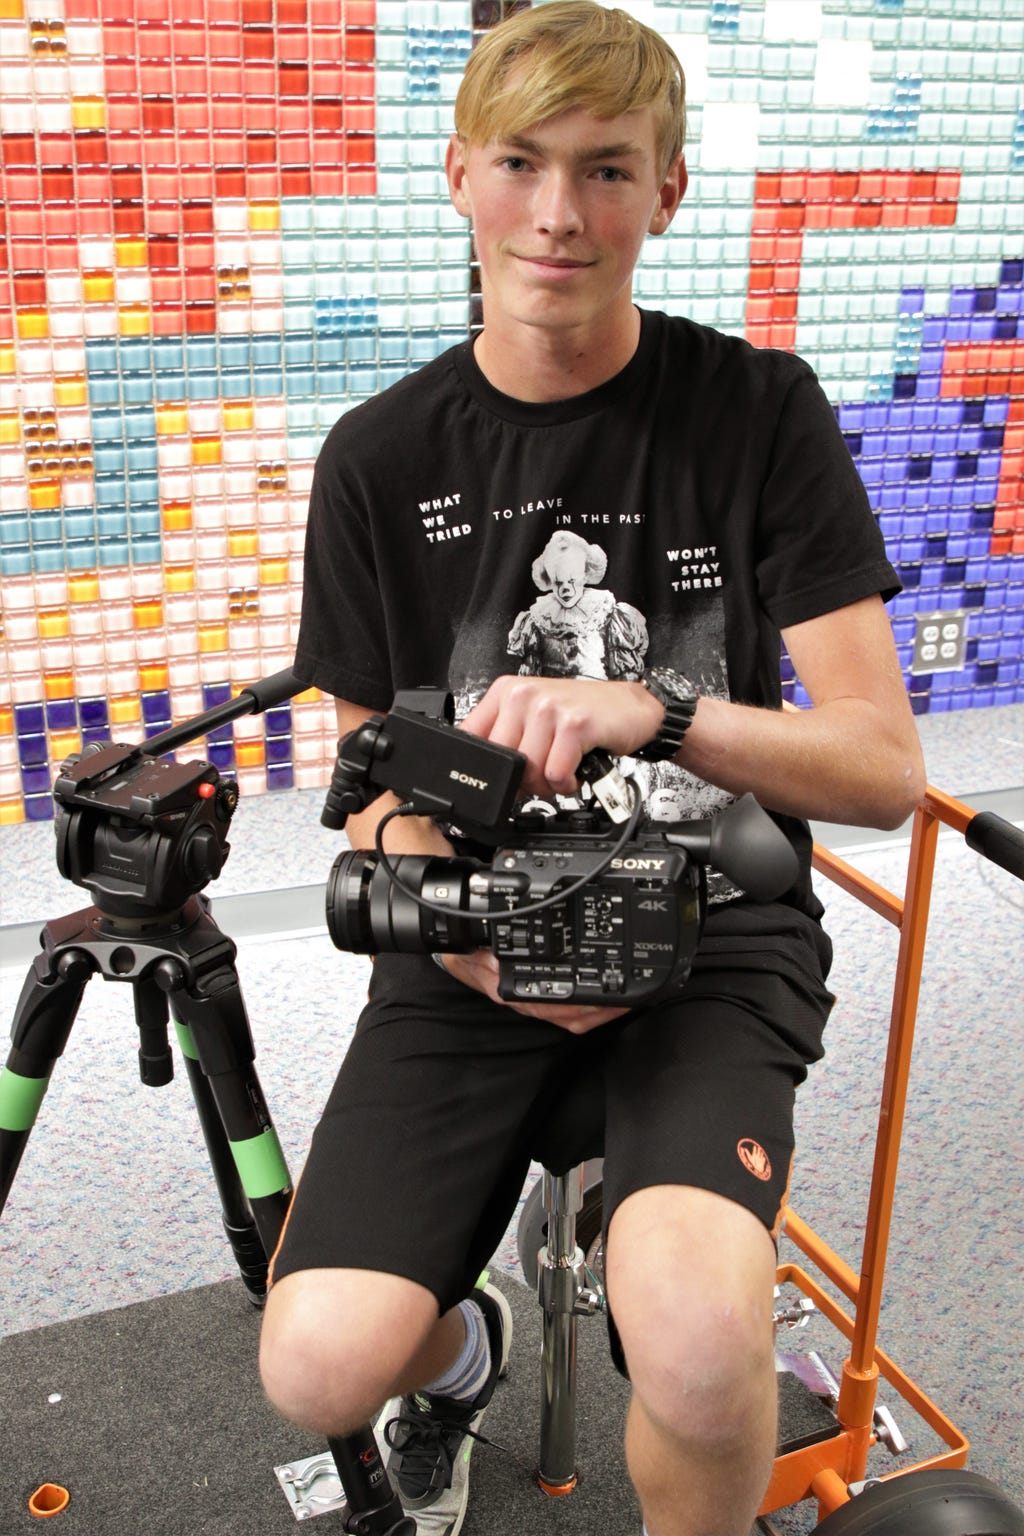 San Juan College student Carl Keller displays a video camera from the school's digital arts program.